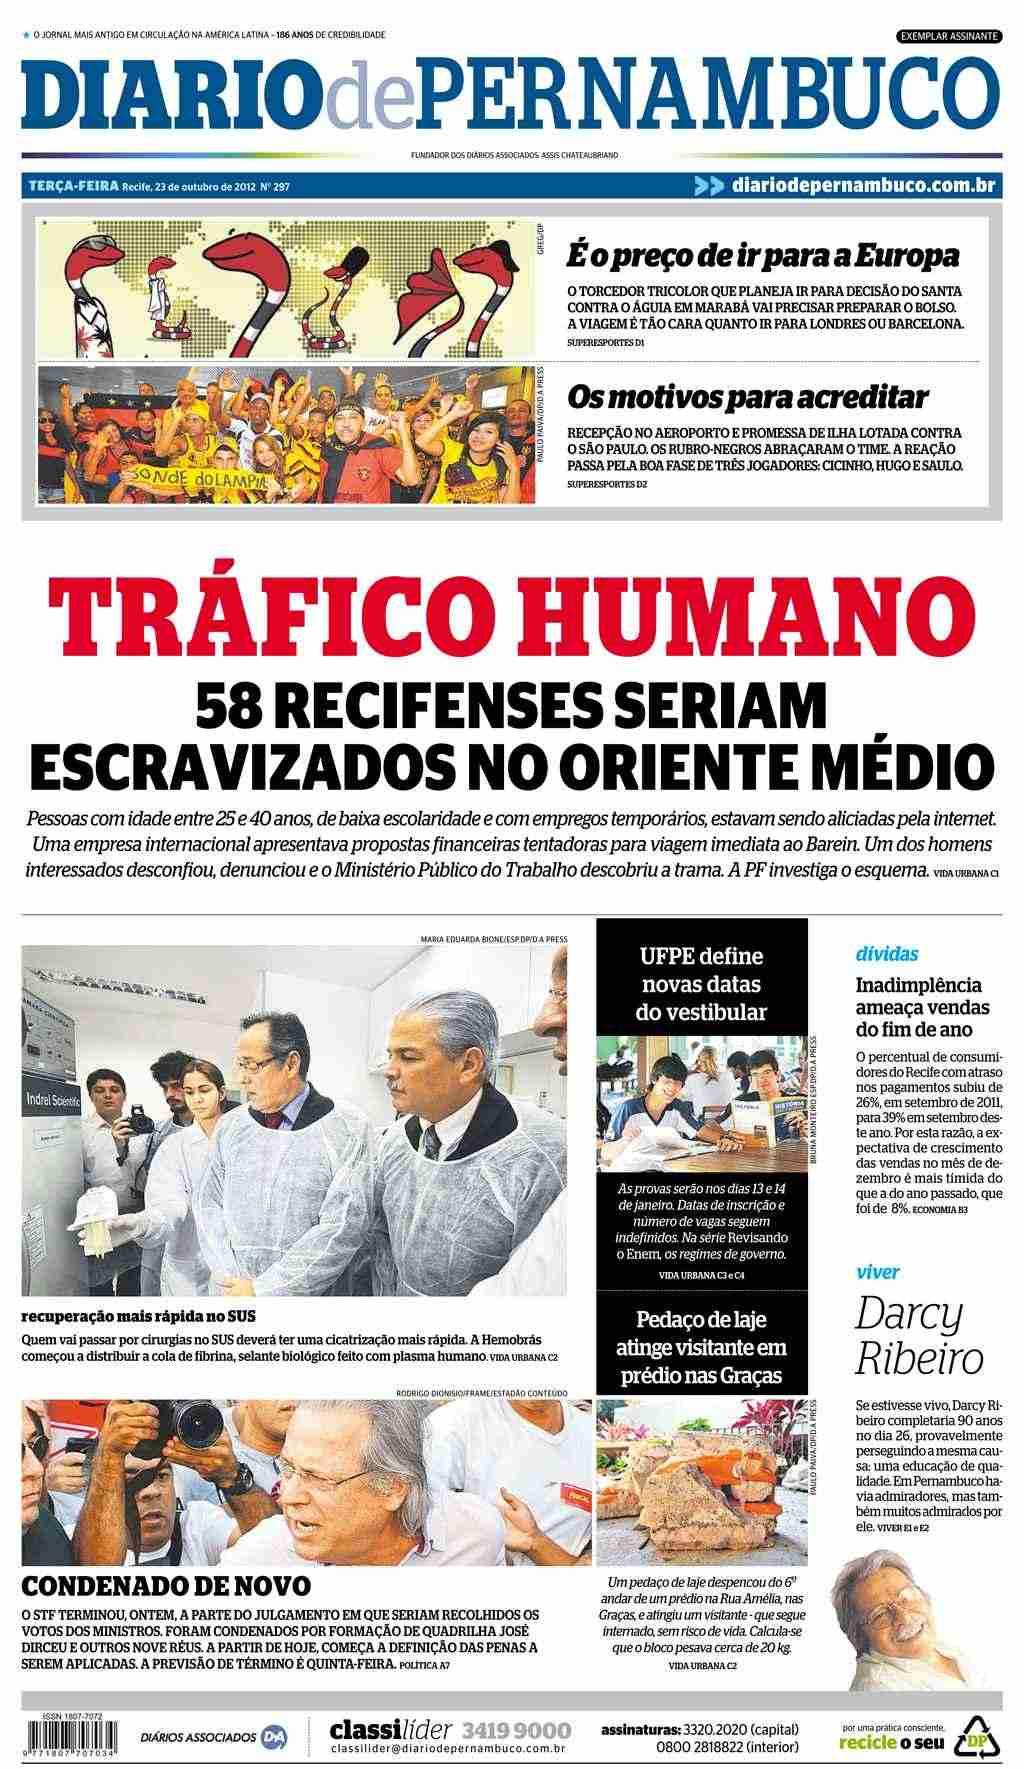 http://imgsapp.impresso.diariodepernambuco.com.br/portlet/354/20121023001730872310a.jpg